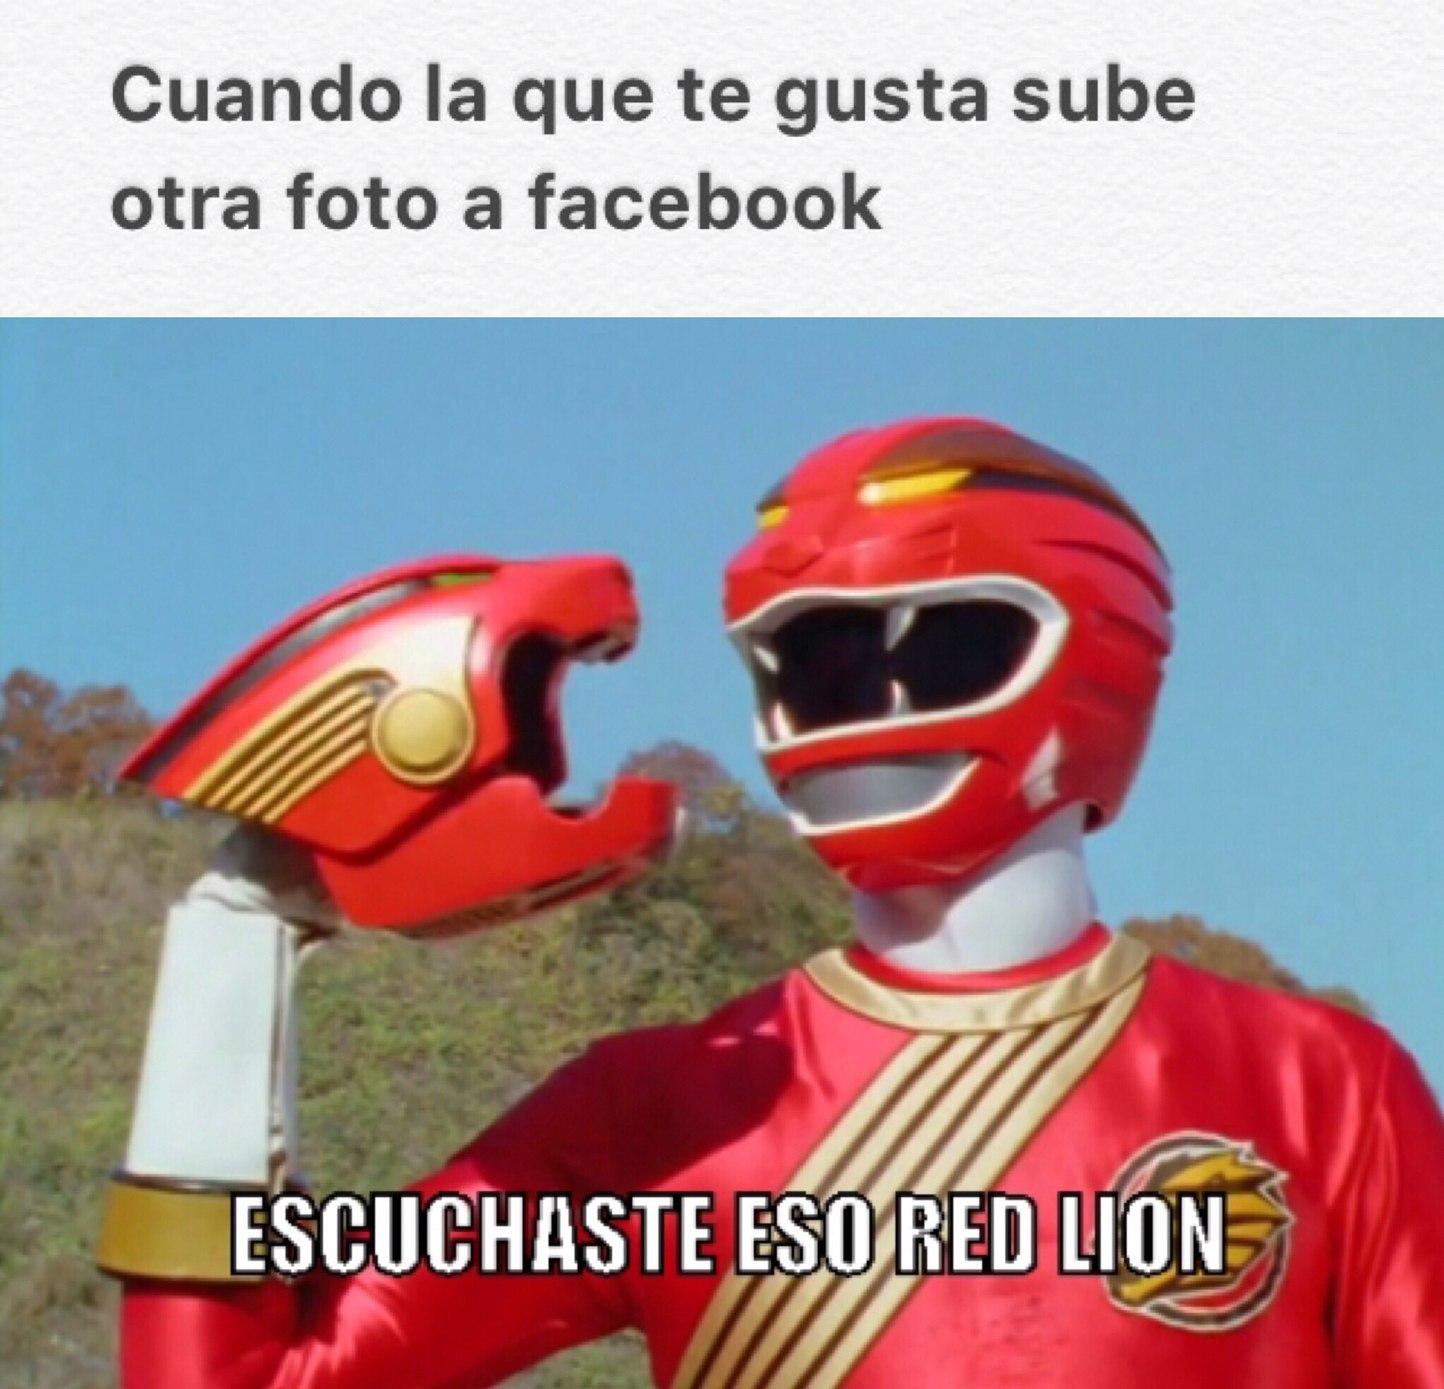 escuchaste eso red lion - meme